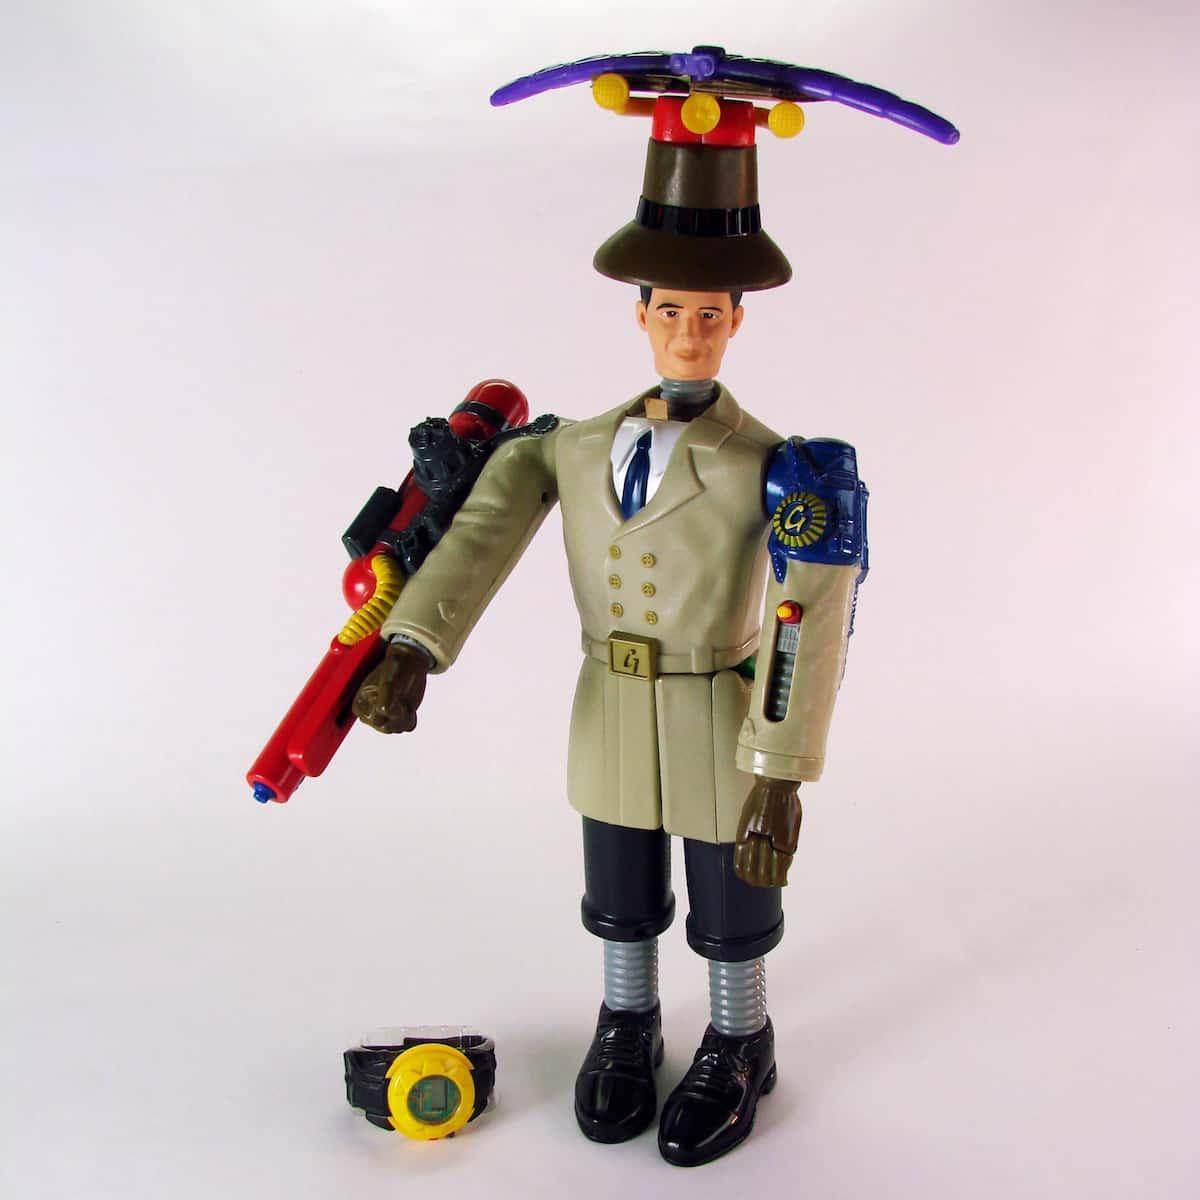 inspector gadget toy mcdonald's